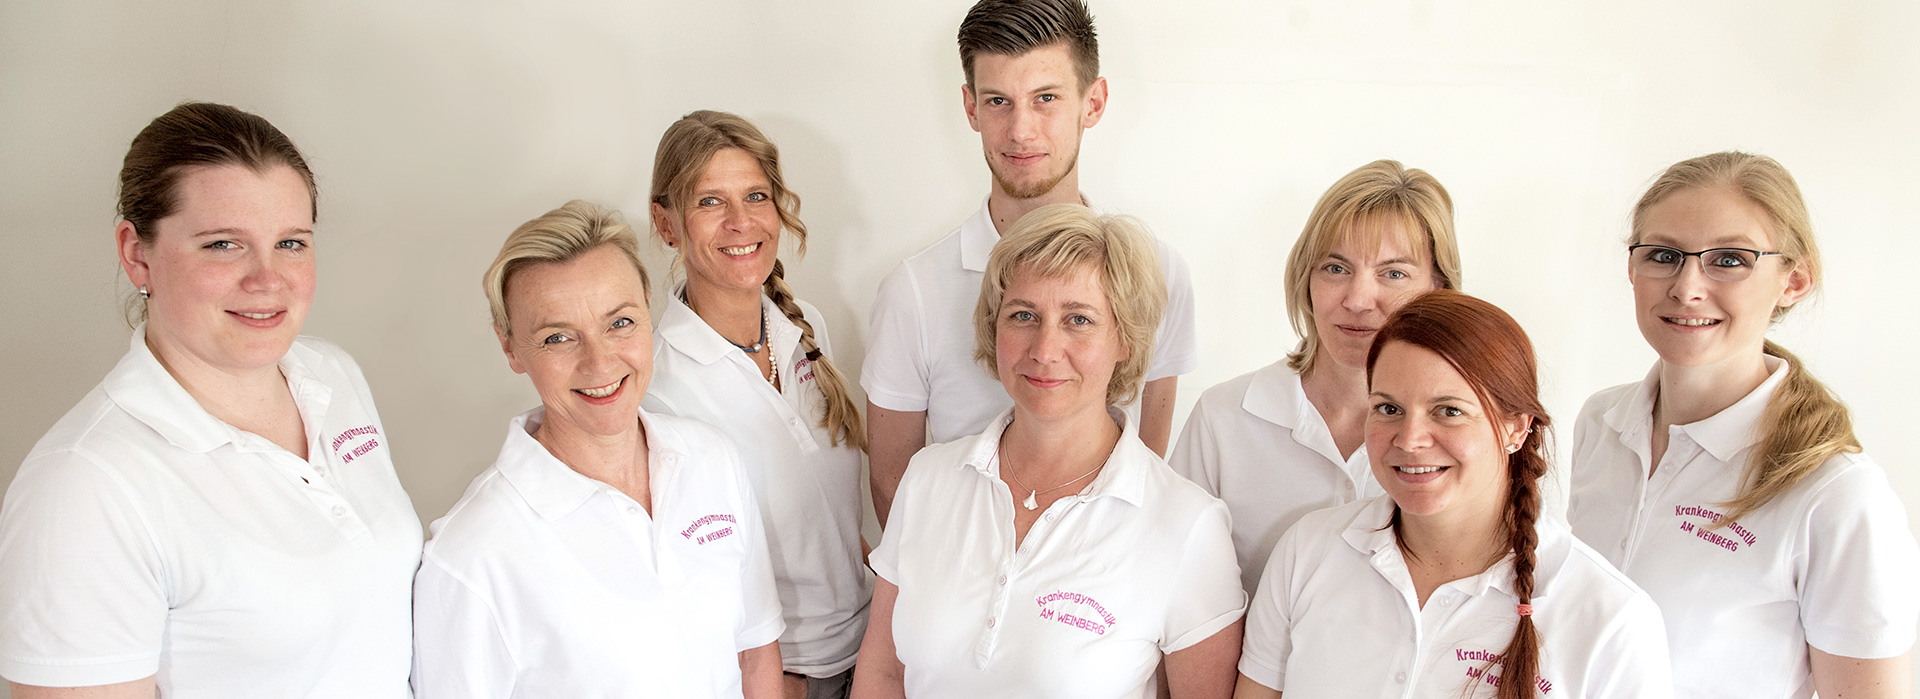 Team Krankengymnastik am Weinberg, Reinfeld